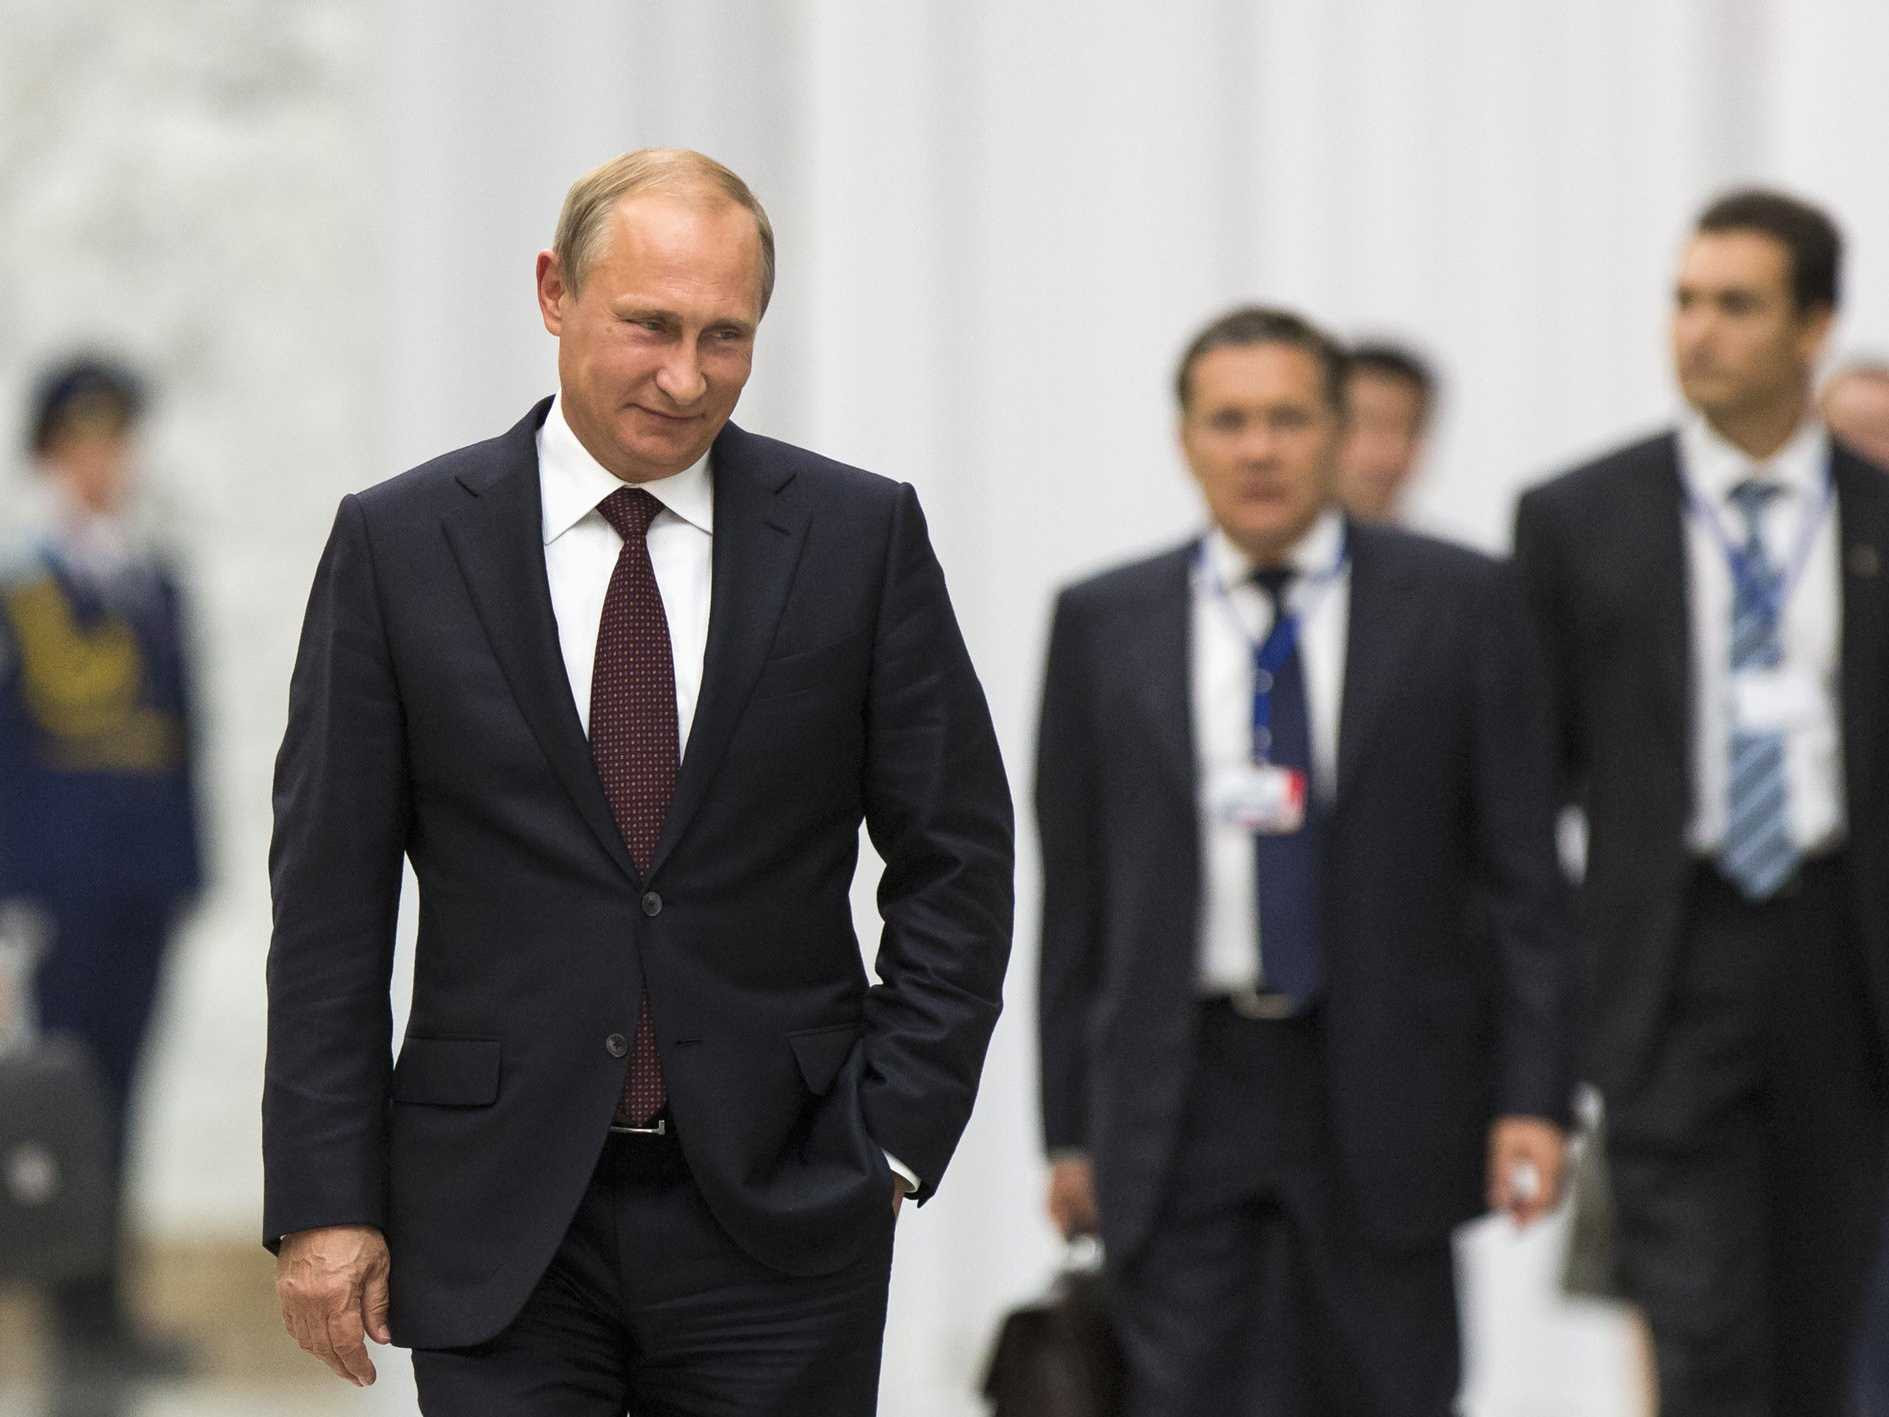 Putin Wants Statehood For Southeastern Ukraine